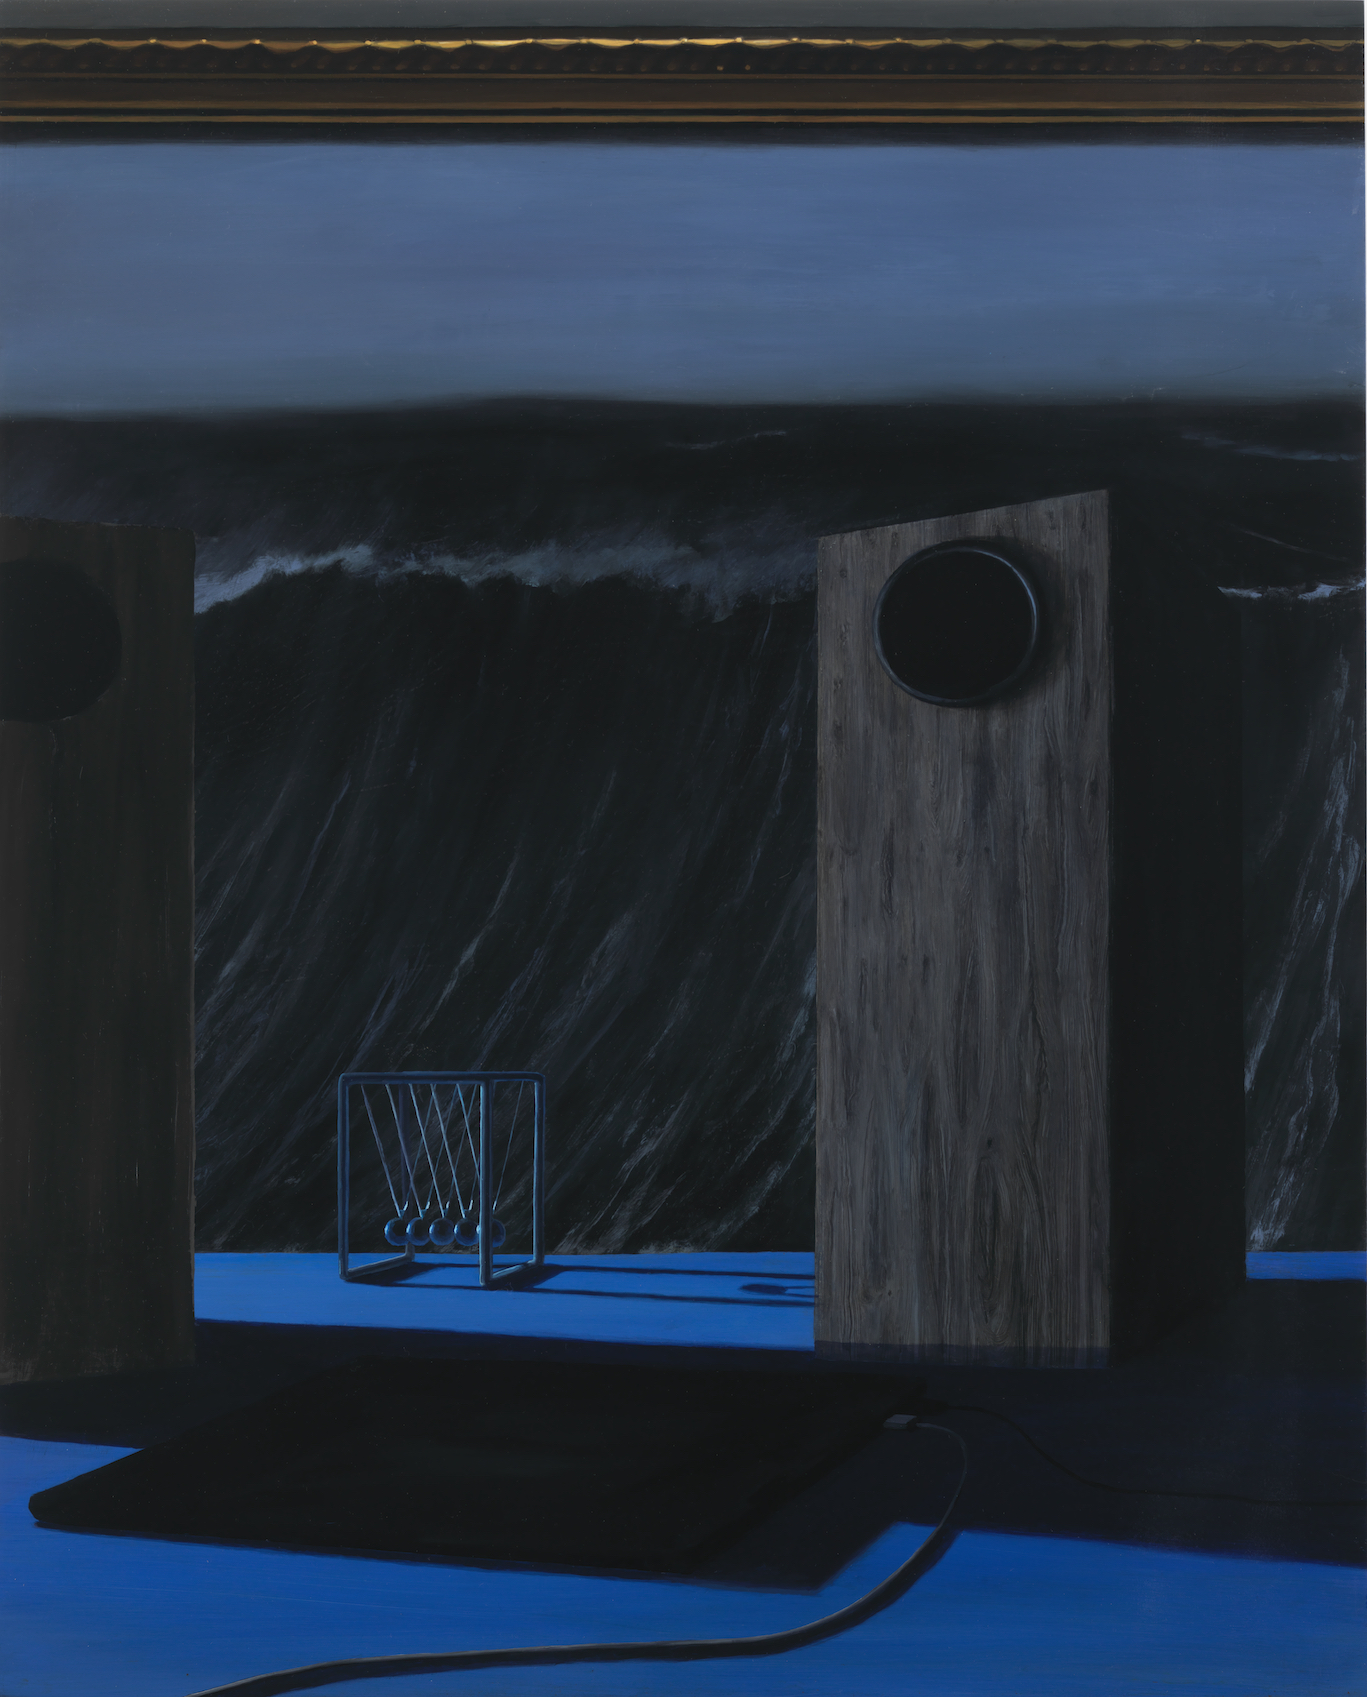 "Alexa, Siri, Landscape  2018  oil on panel  30"" x 25"" (76.2 x 62 cm)"